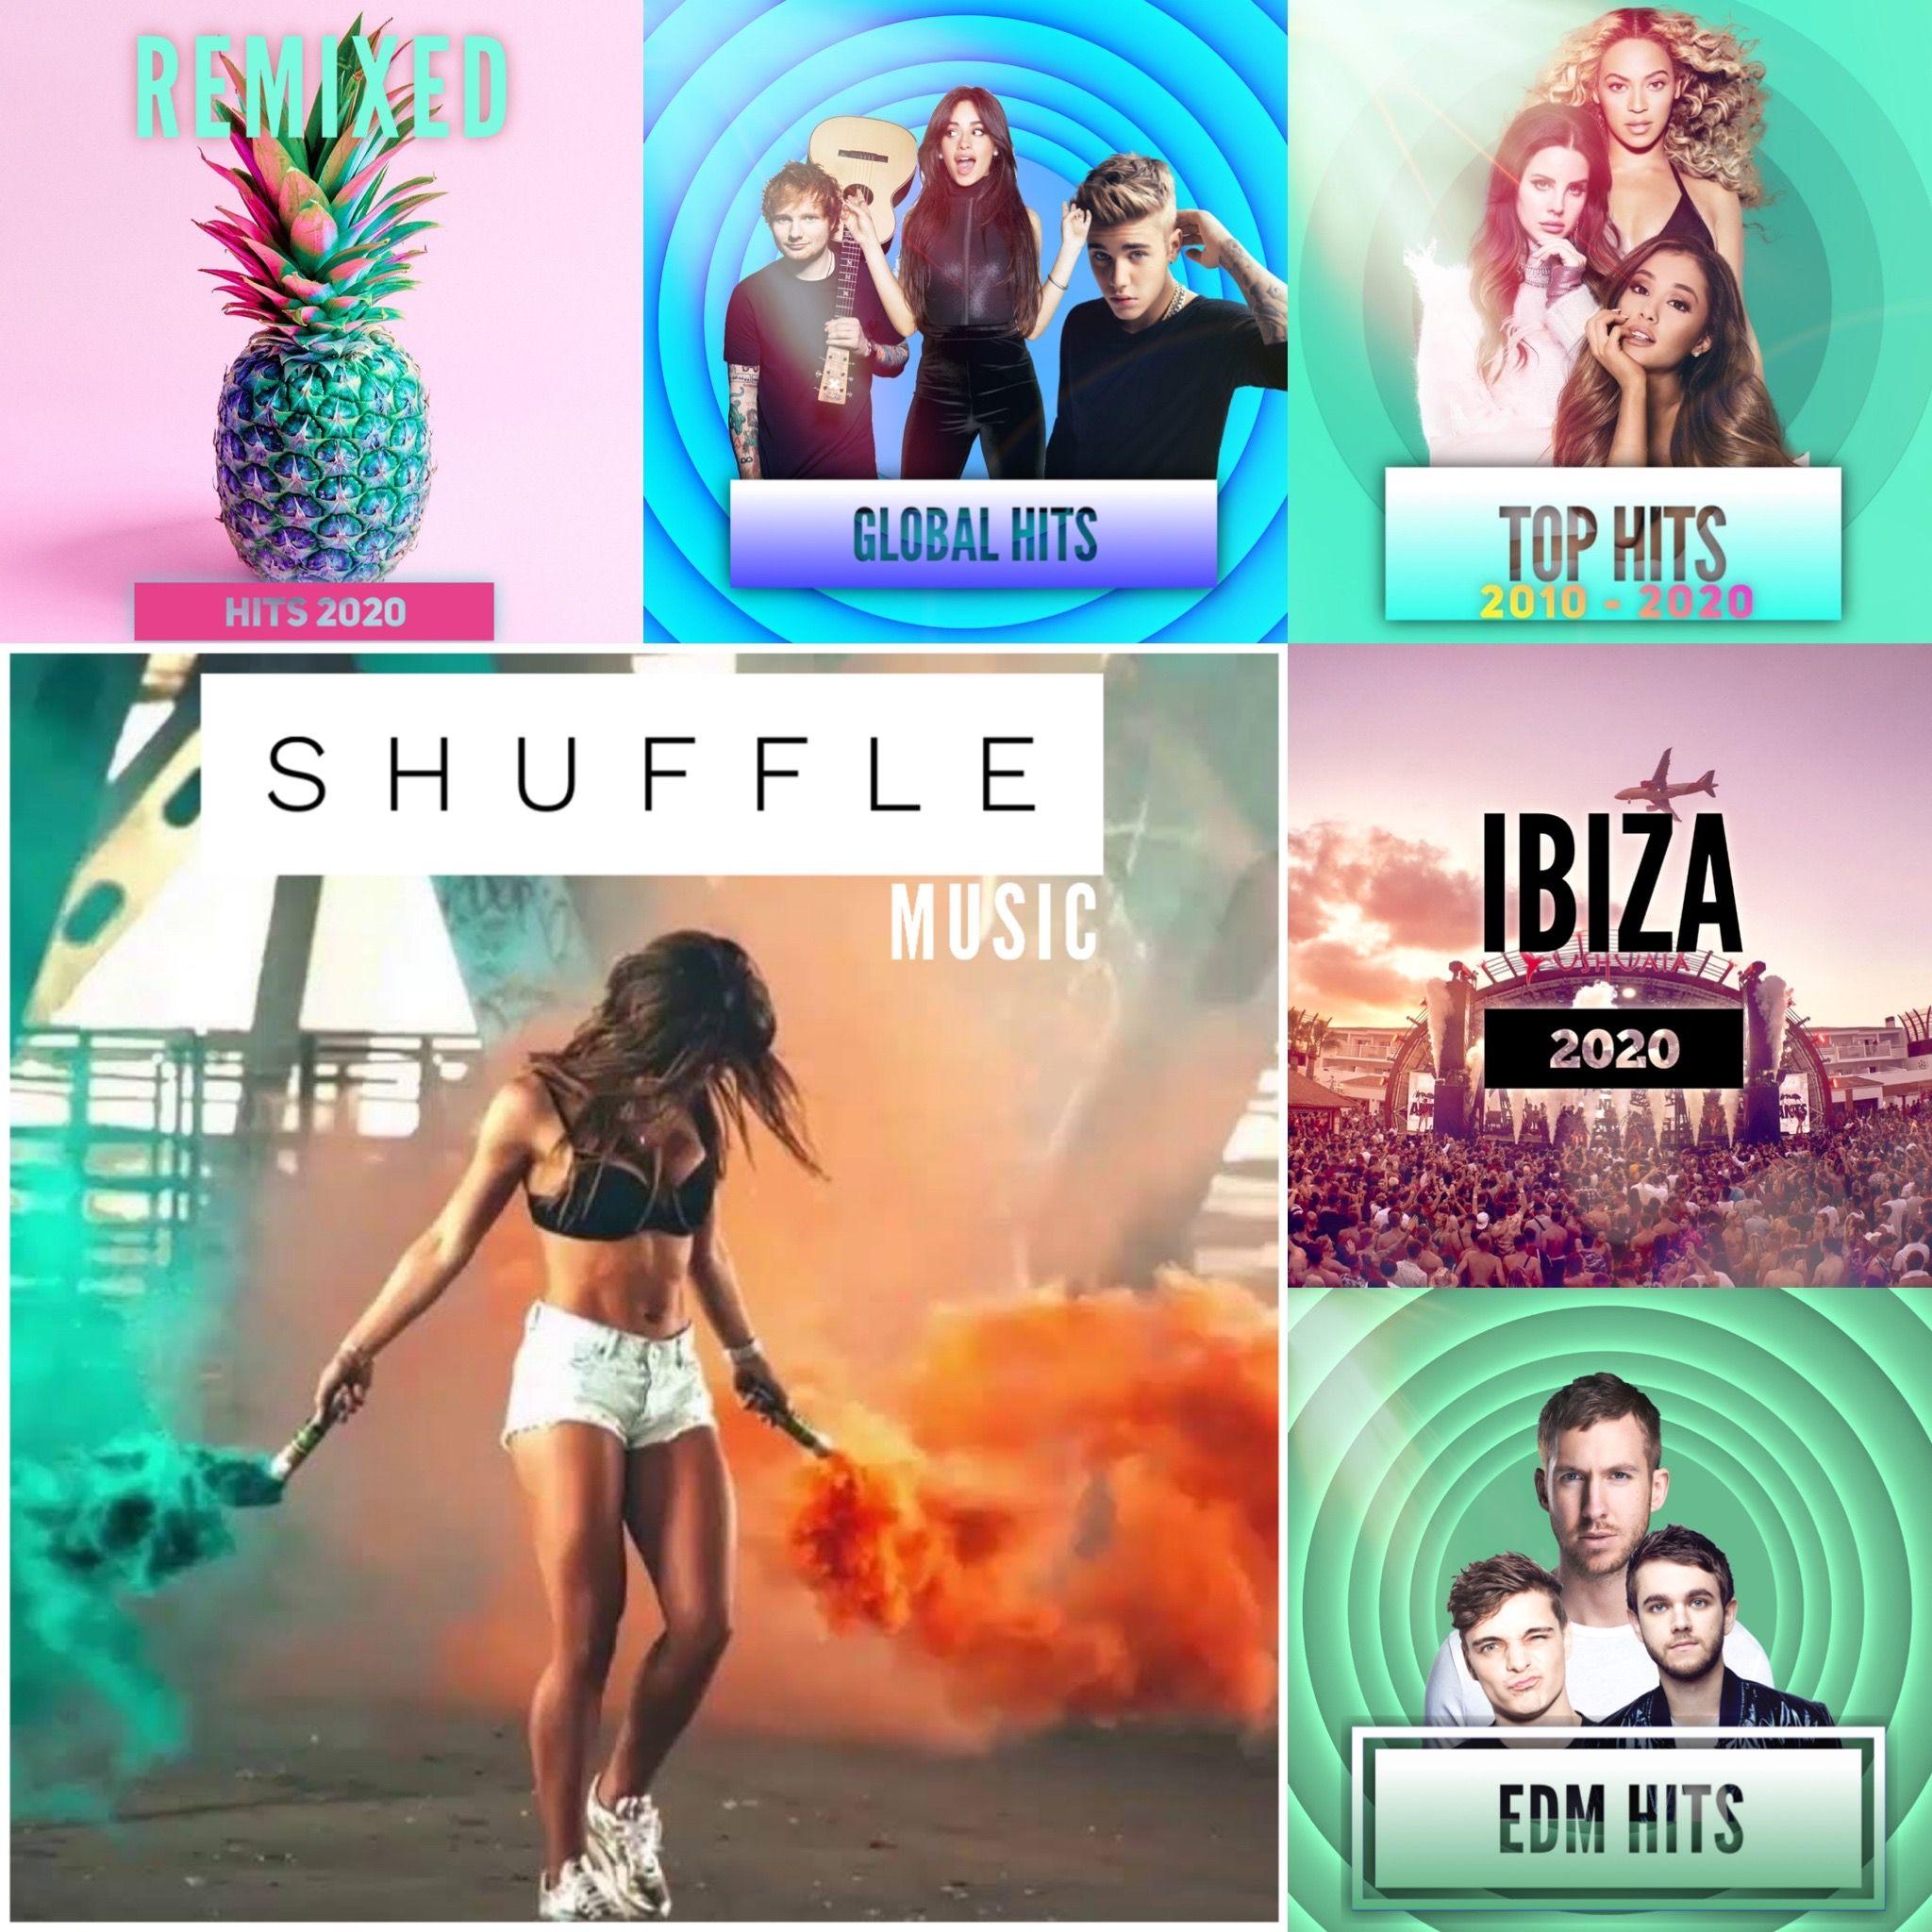 Best Spotify Playlists right now🔥 in 2020 Best spotify